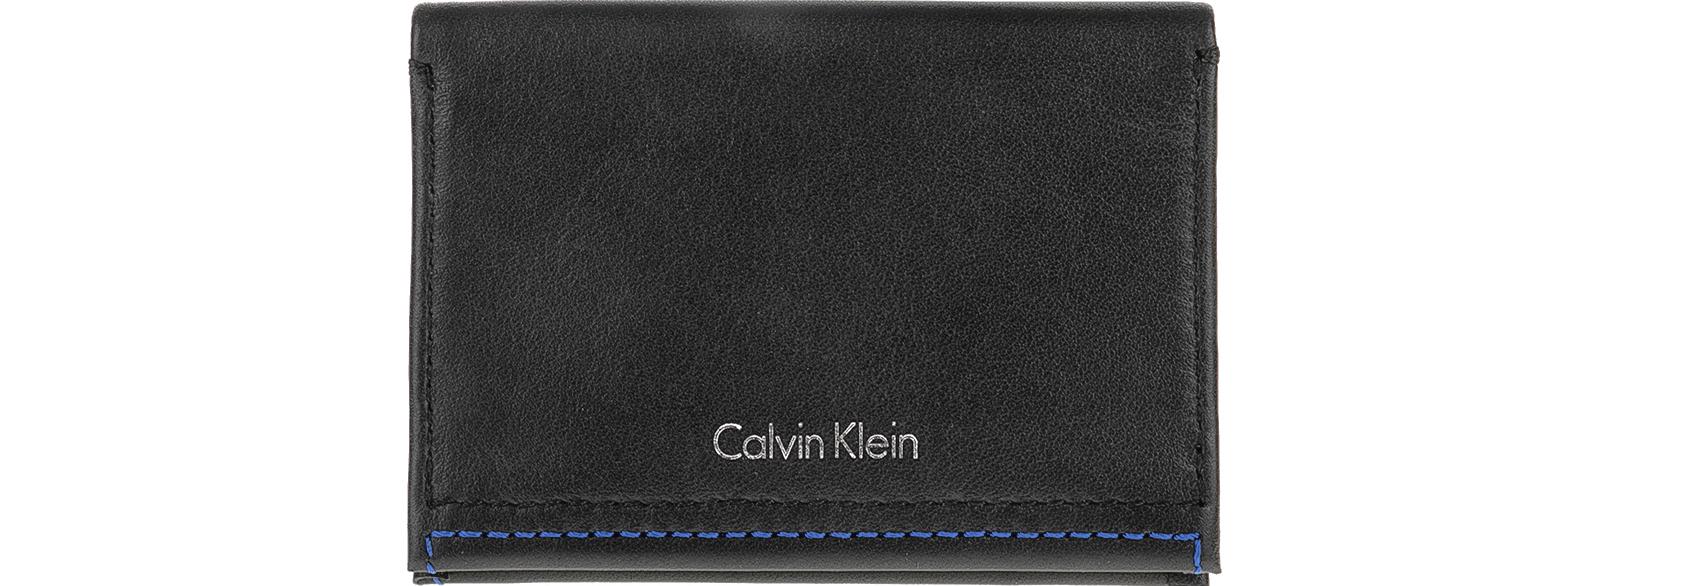 CALVIN KLEIN JEANS - Θήκη καρτών Calvin Klein Jeans μαύρη